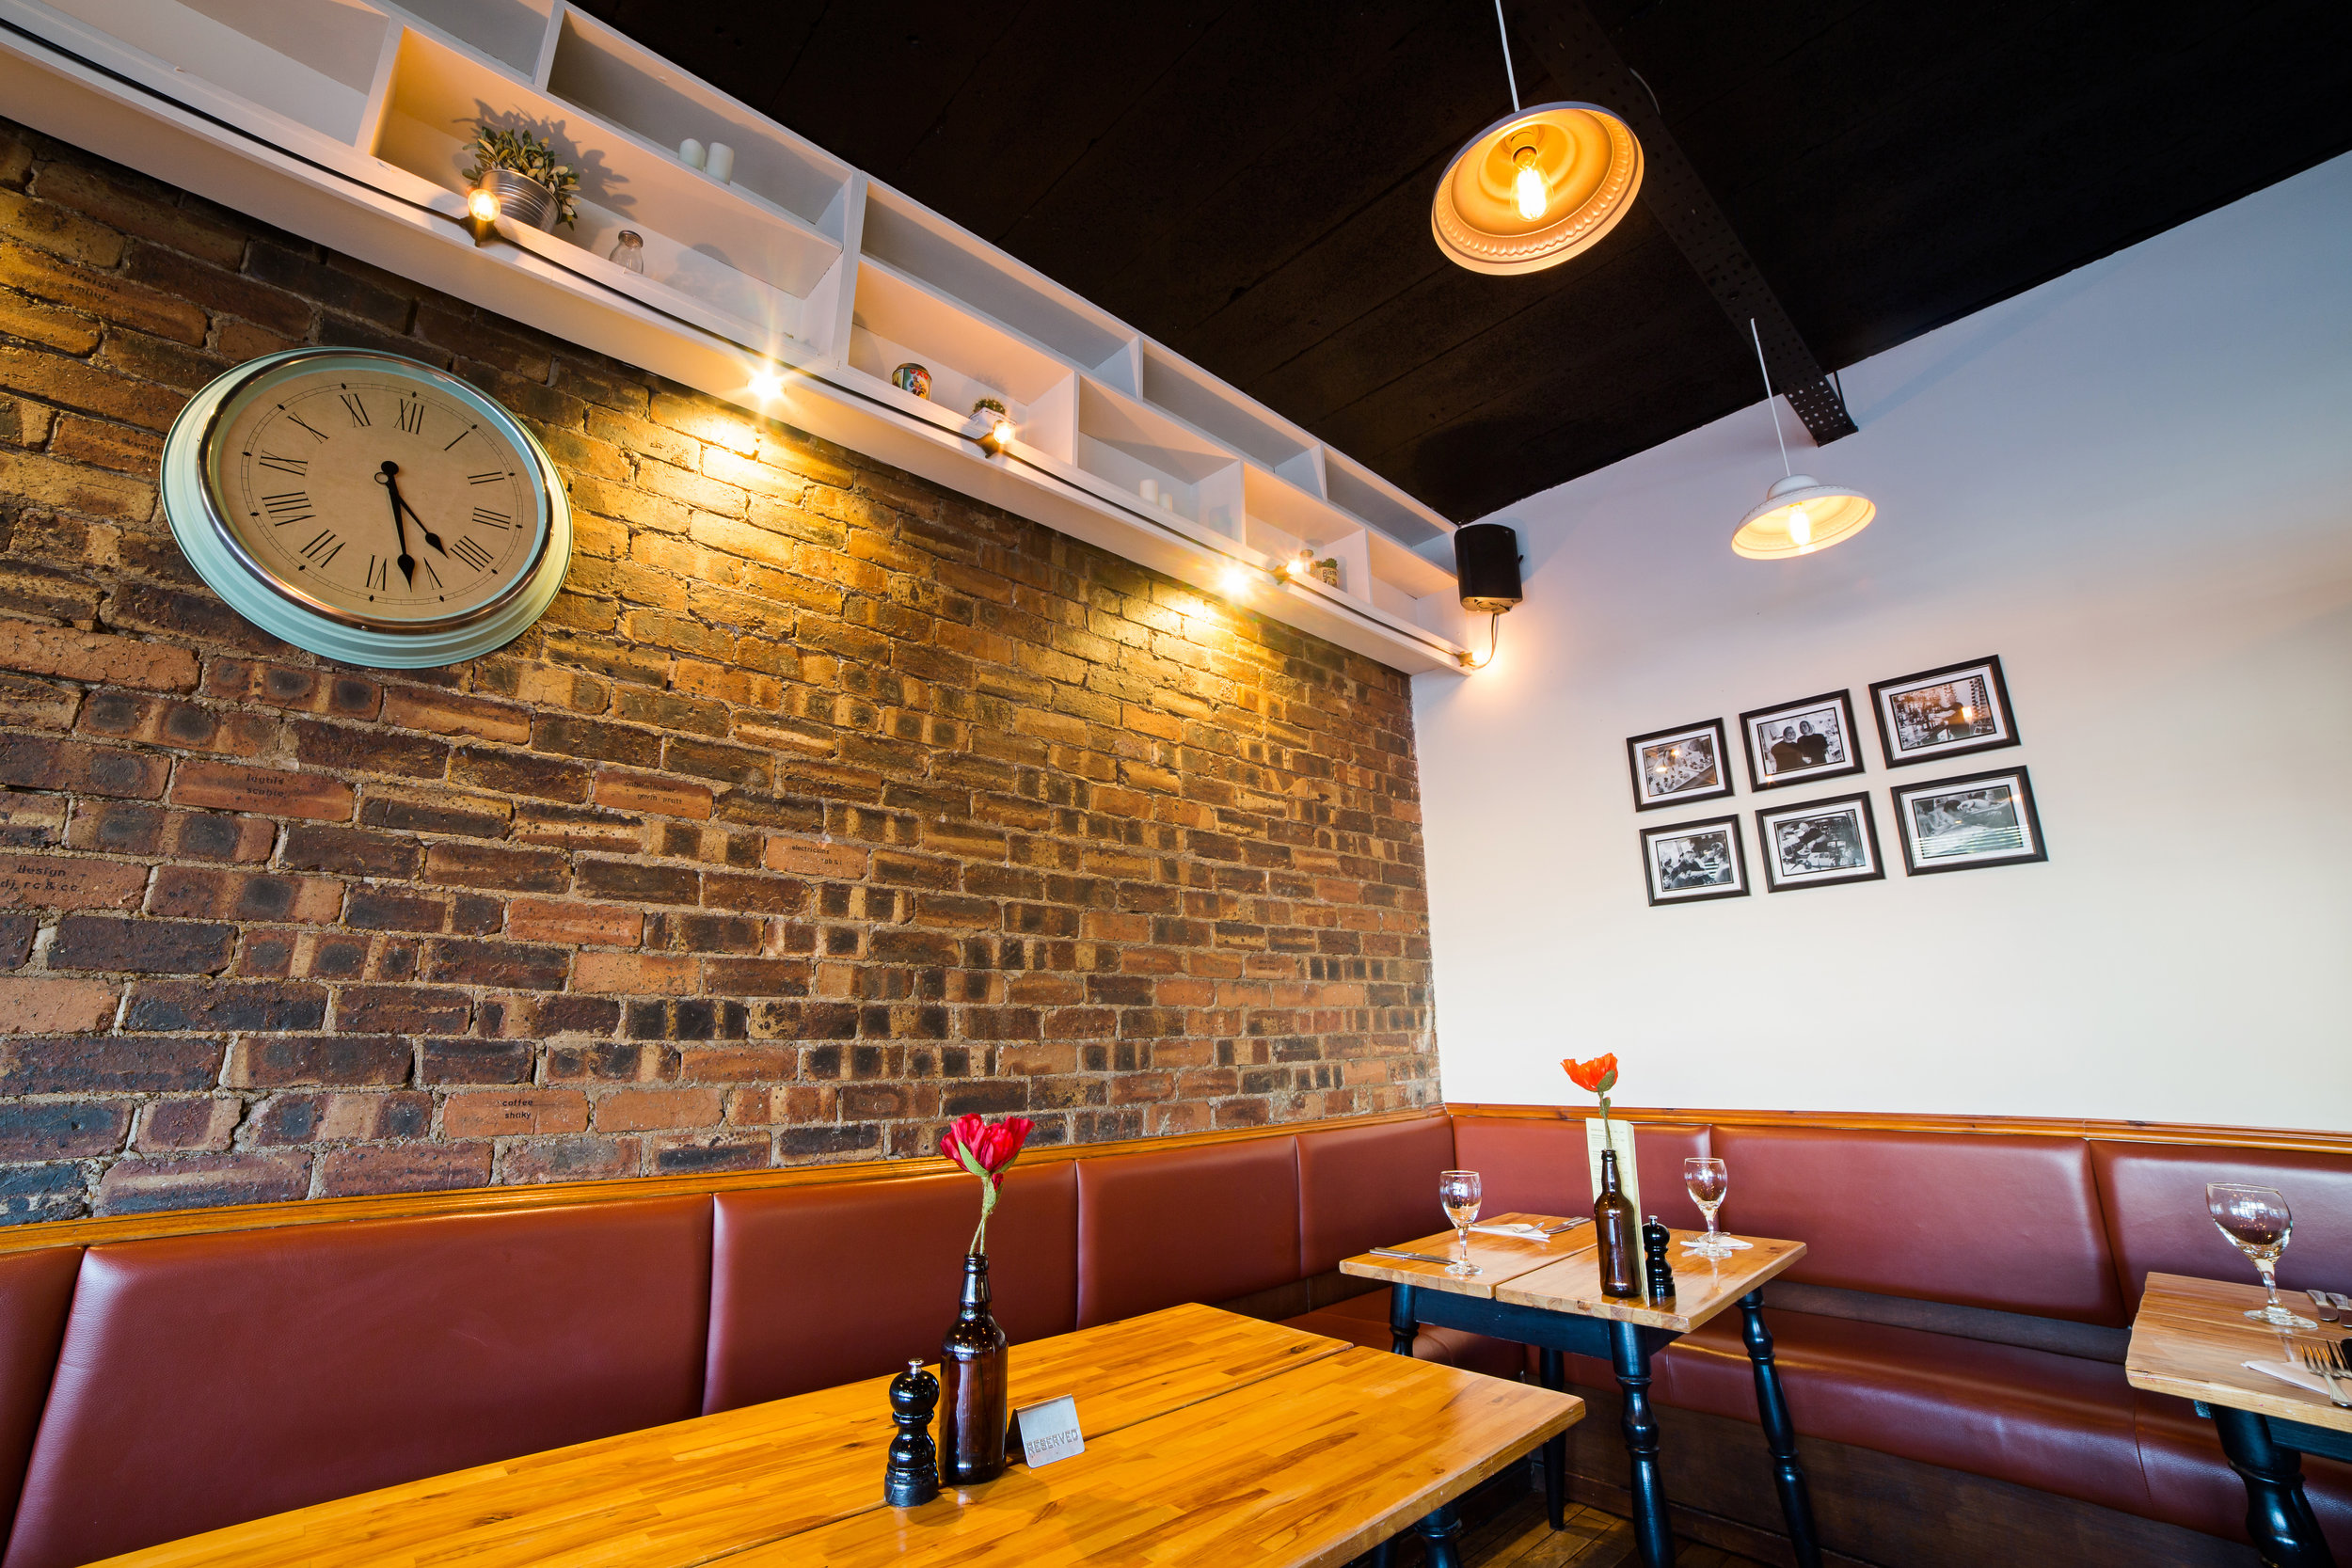 restaurant-interior-design-photography-gallery-wall-clock-glasgow-johnstone